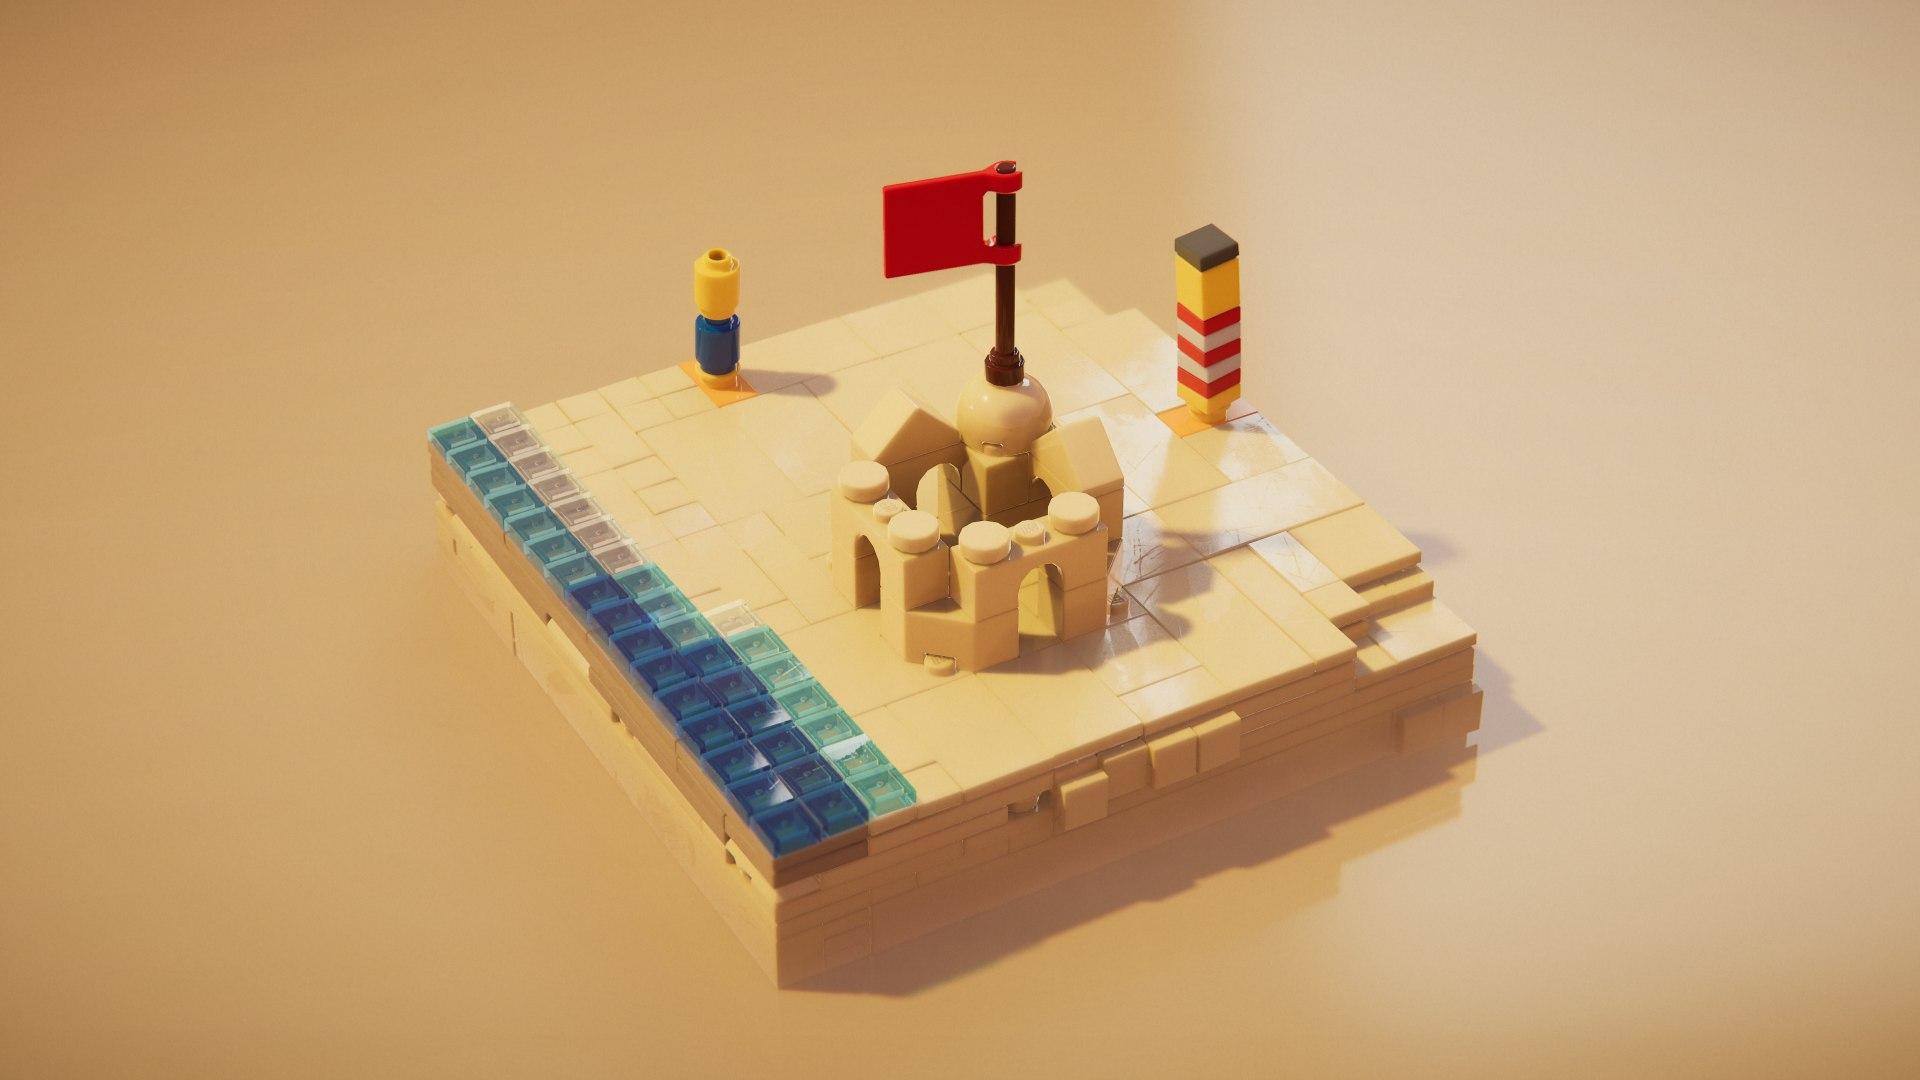 Lego Builder's Journey gameplay impressions — Small bricks, big adventure